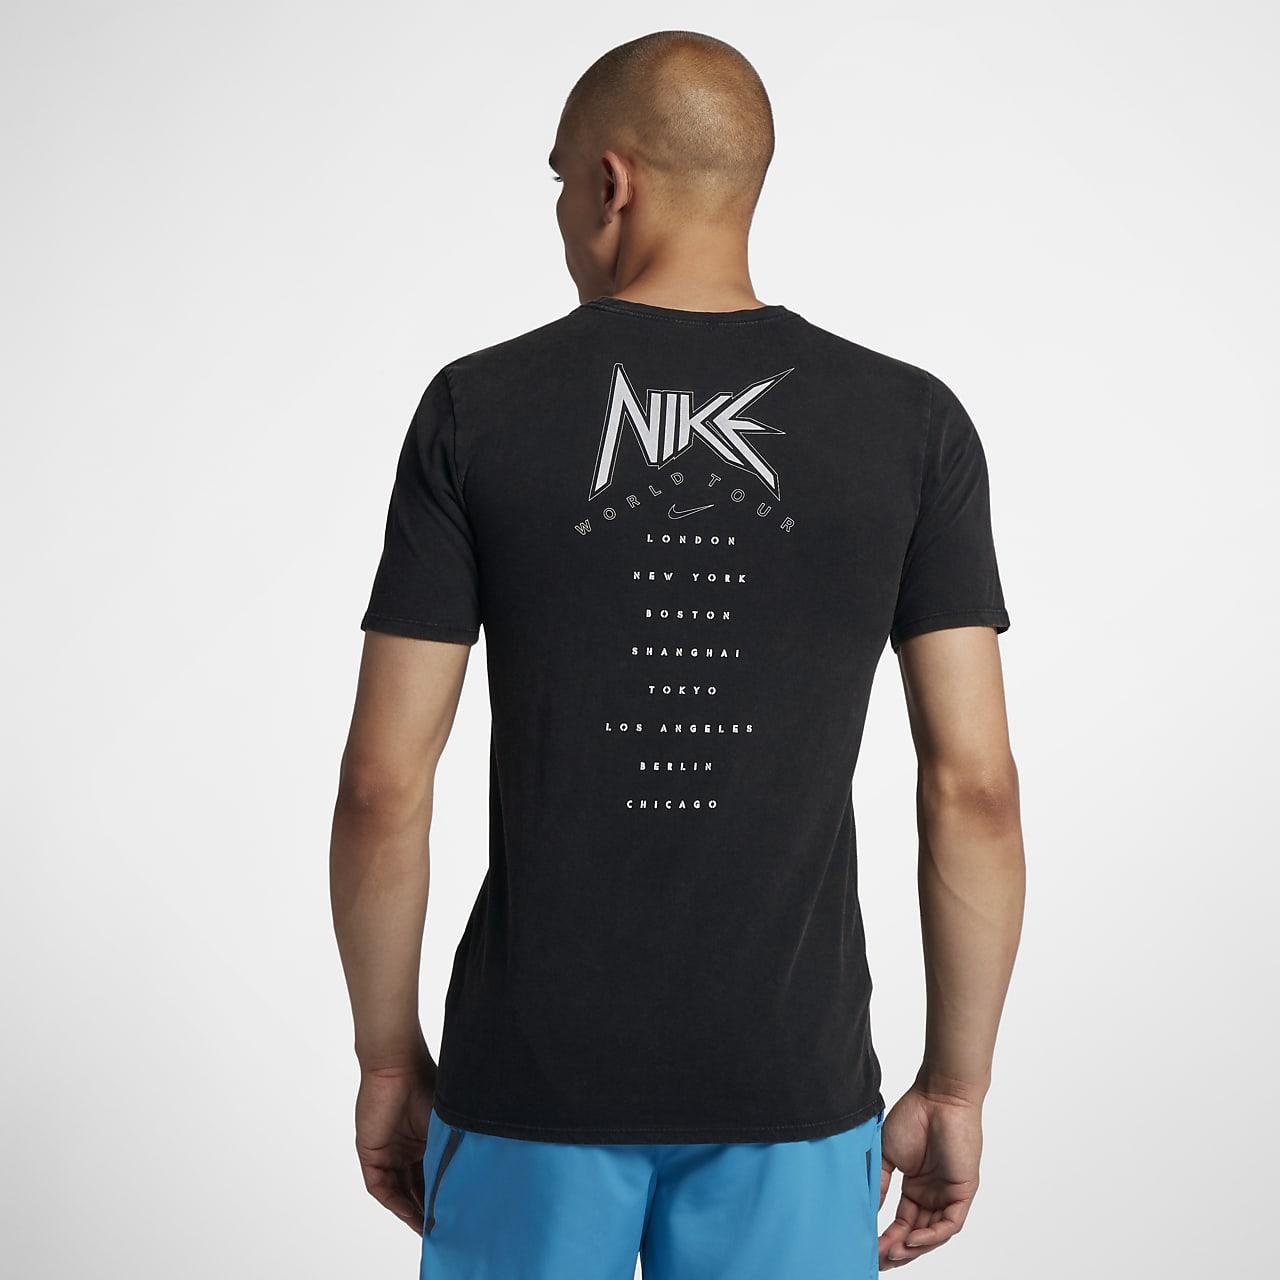 nike running tshirt